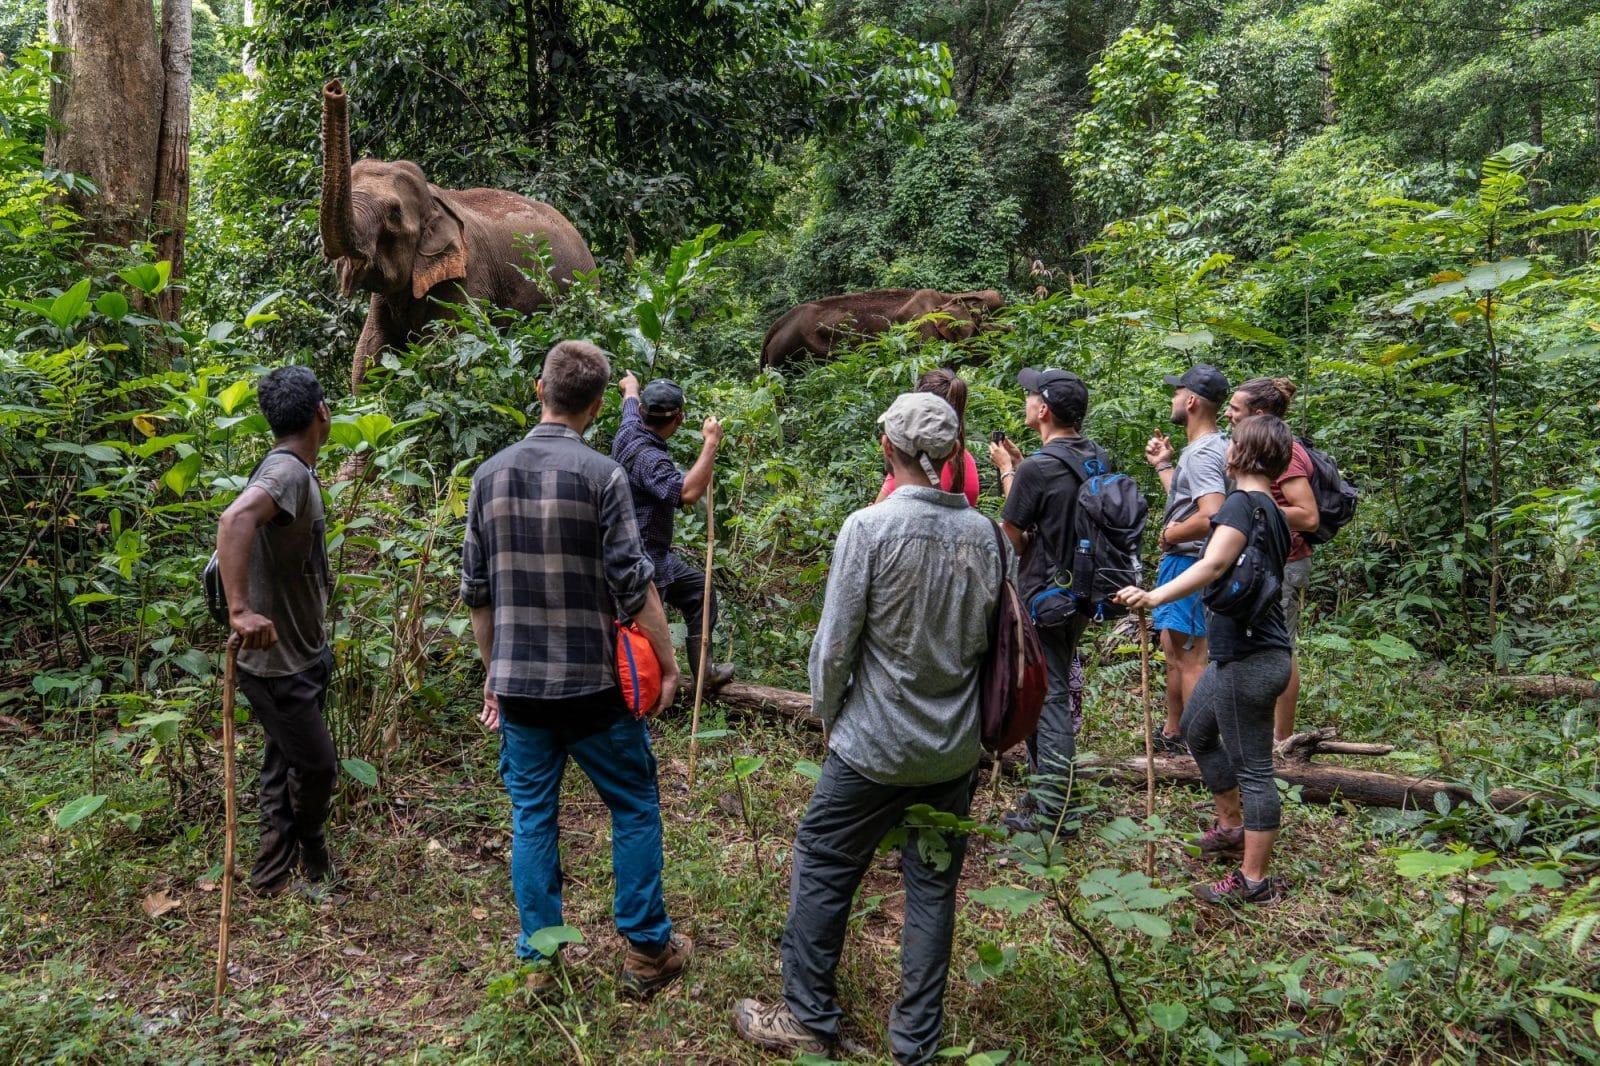 Volunteers observing the elephants